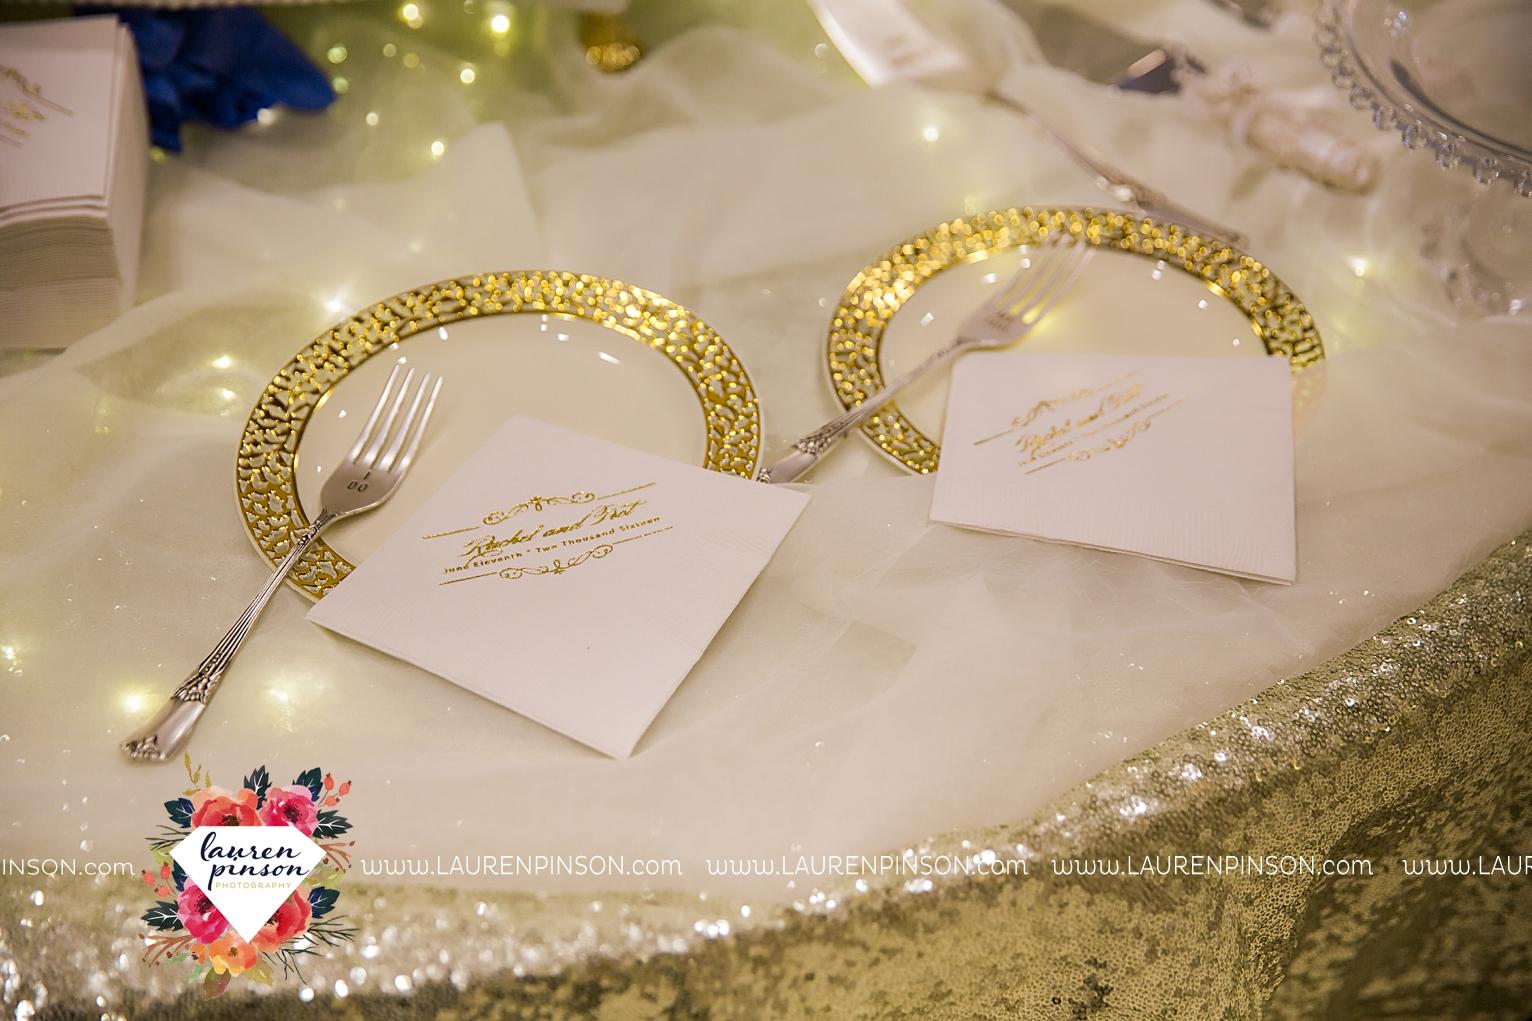 wichita-falls-texas-wedding-photographer-the-forum-by-the-kemp-mayfield-events-ulta-gold-glitter_2857.jpg